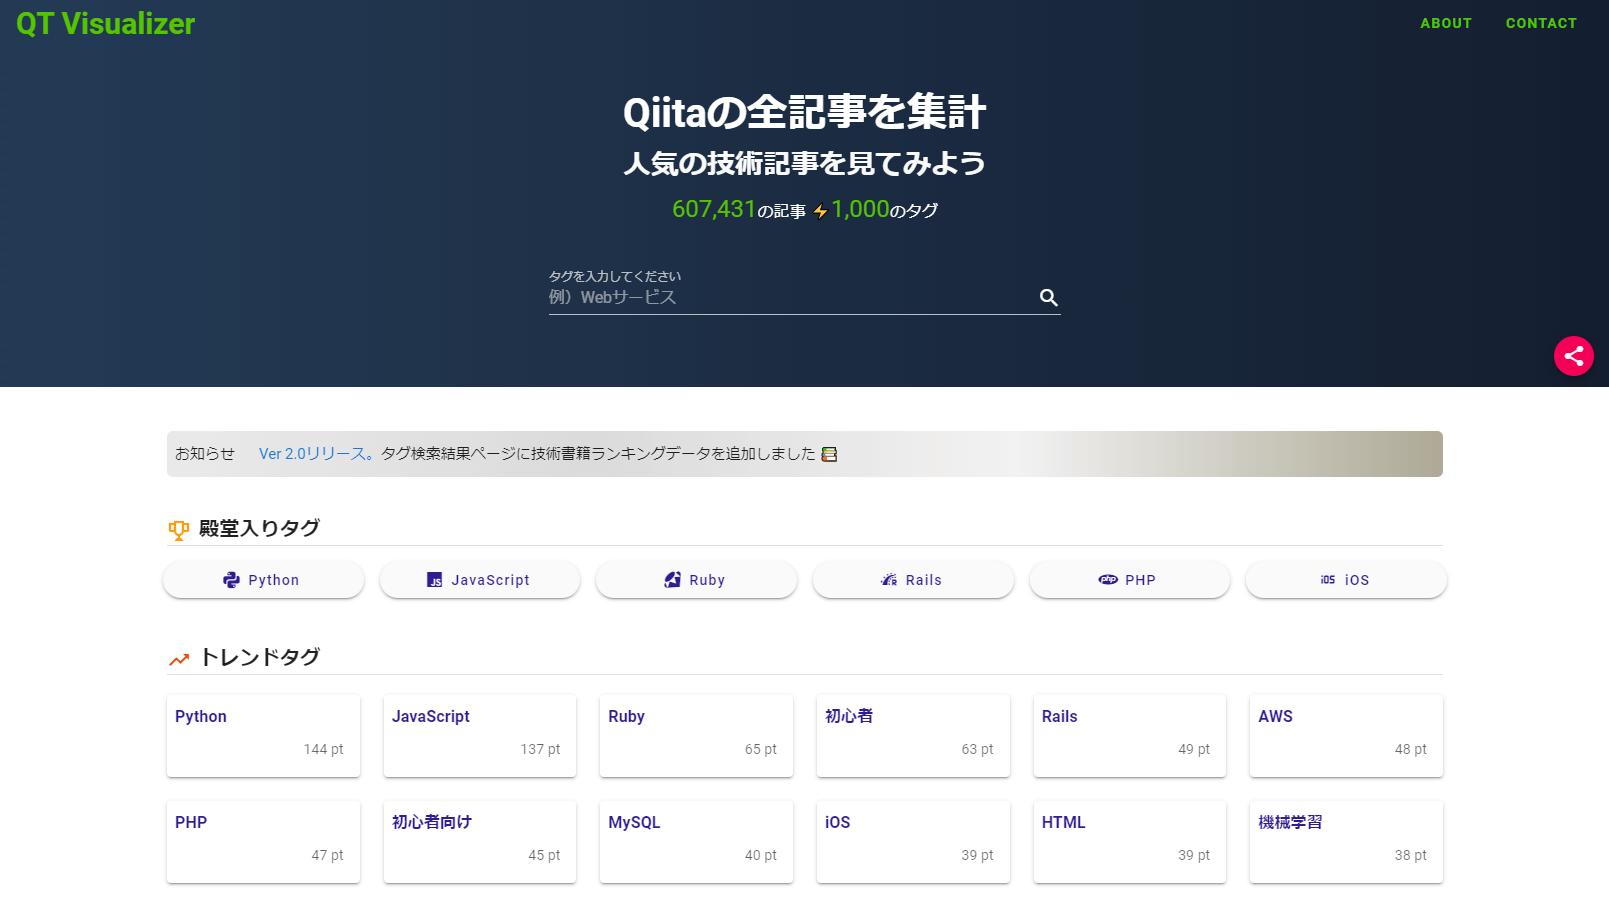 QT Visualizer|【Qiita技術記事のランキング】